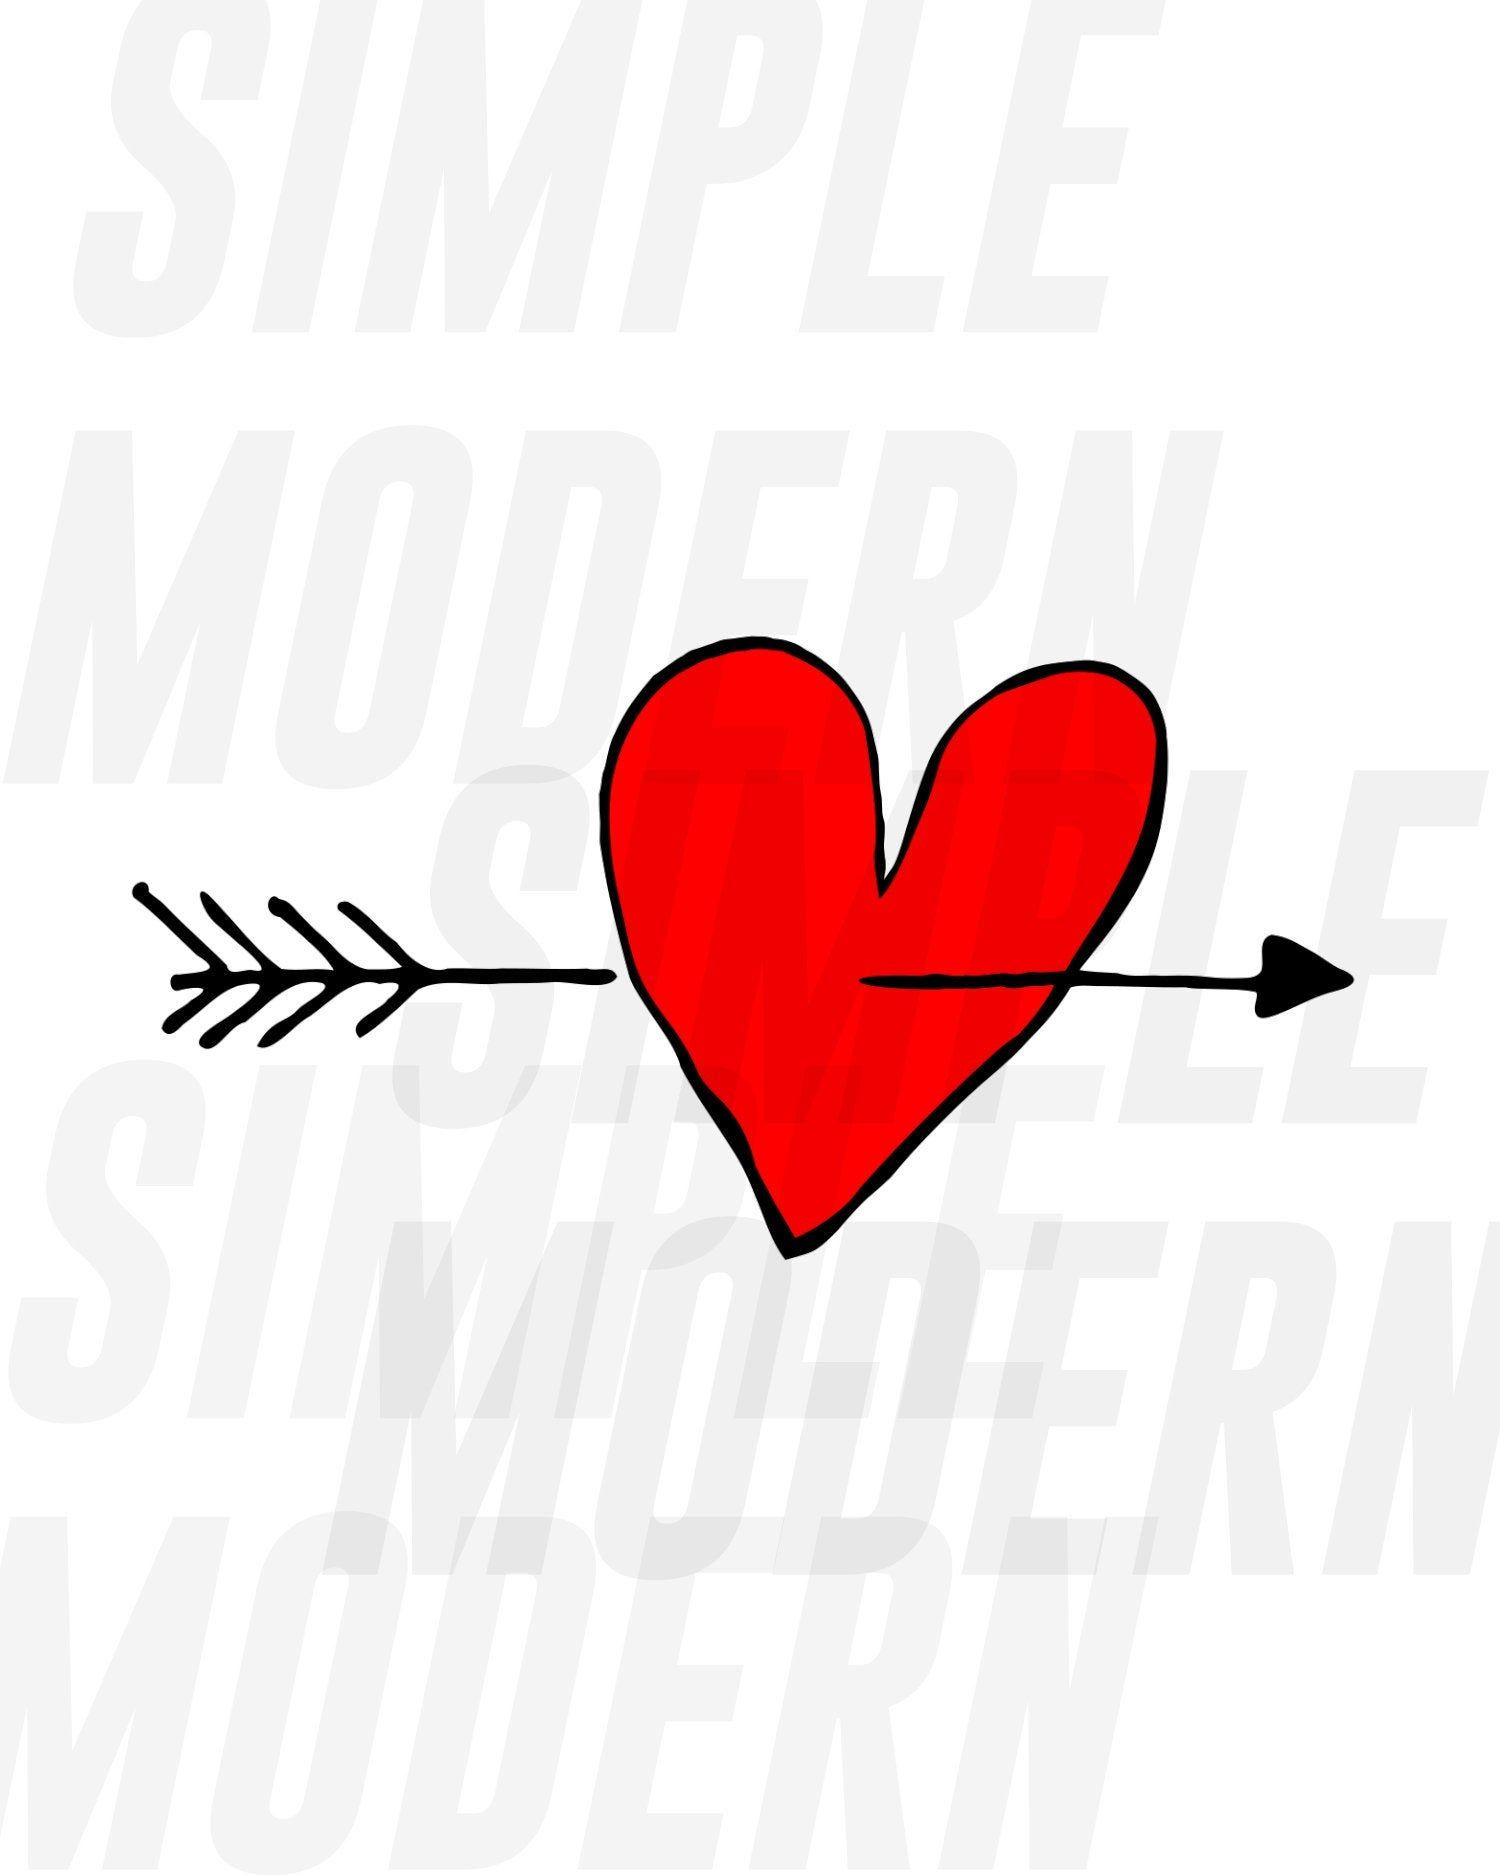 Love Arrow Svg Files Hand Drawn Tribal Heart Arrow Svg Eps Etsy Arrow Svg How To Draw Hands Tribal Heart